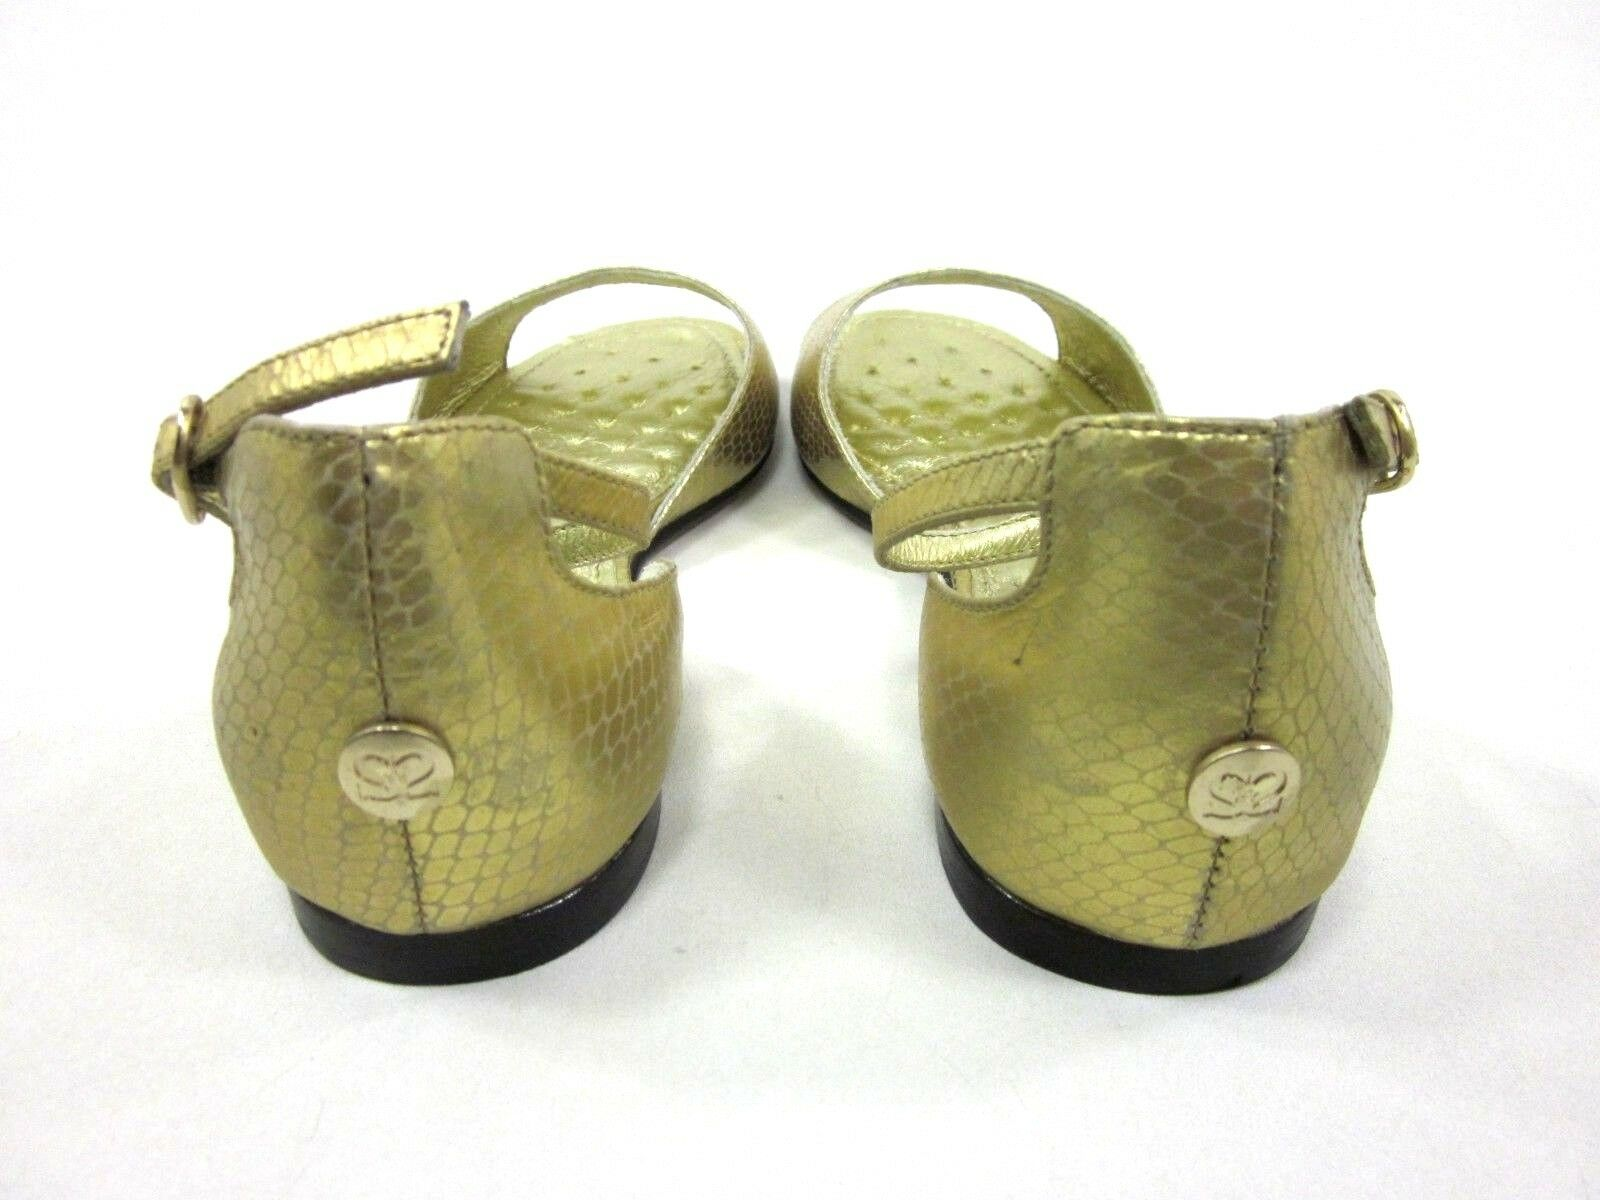 SHANE & SHAWN WOMEN'S PICKENS ANKLE-STRAP SANDAL, gold gold gold US 7, MEDIUM, NEW W O BOX a51d6d